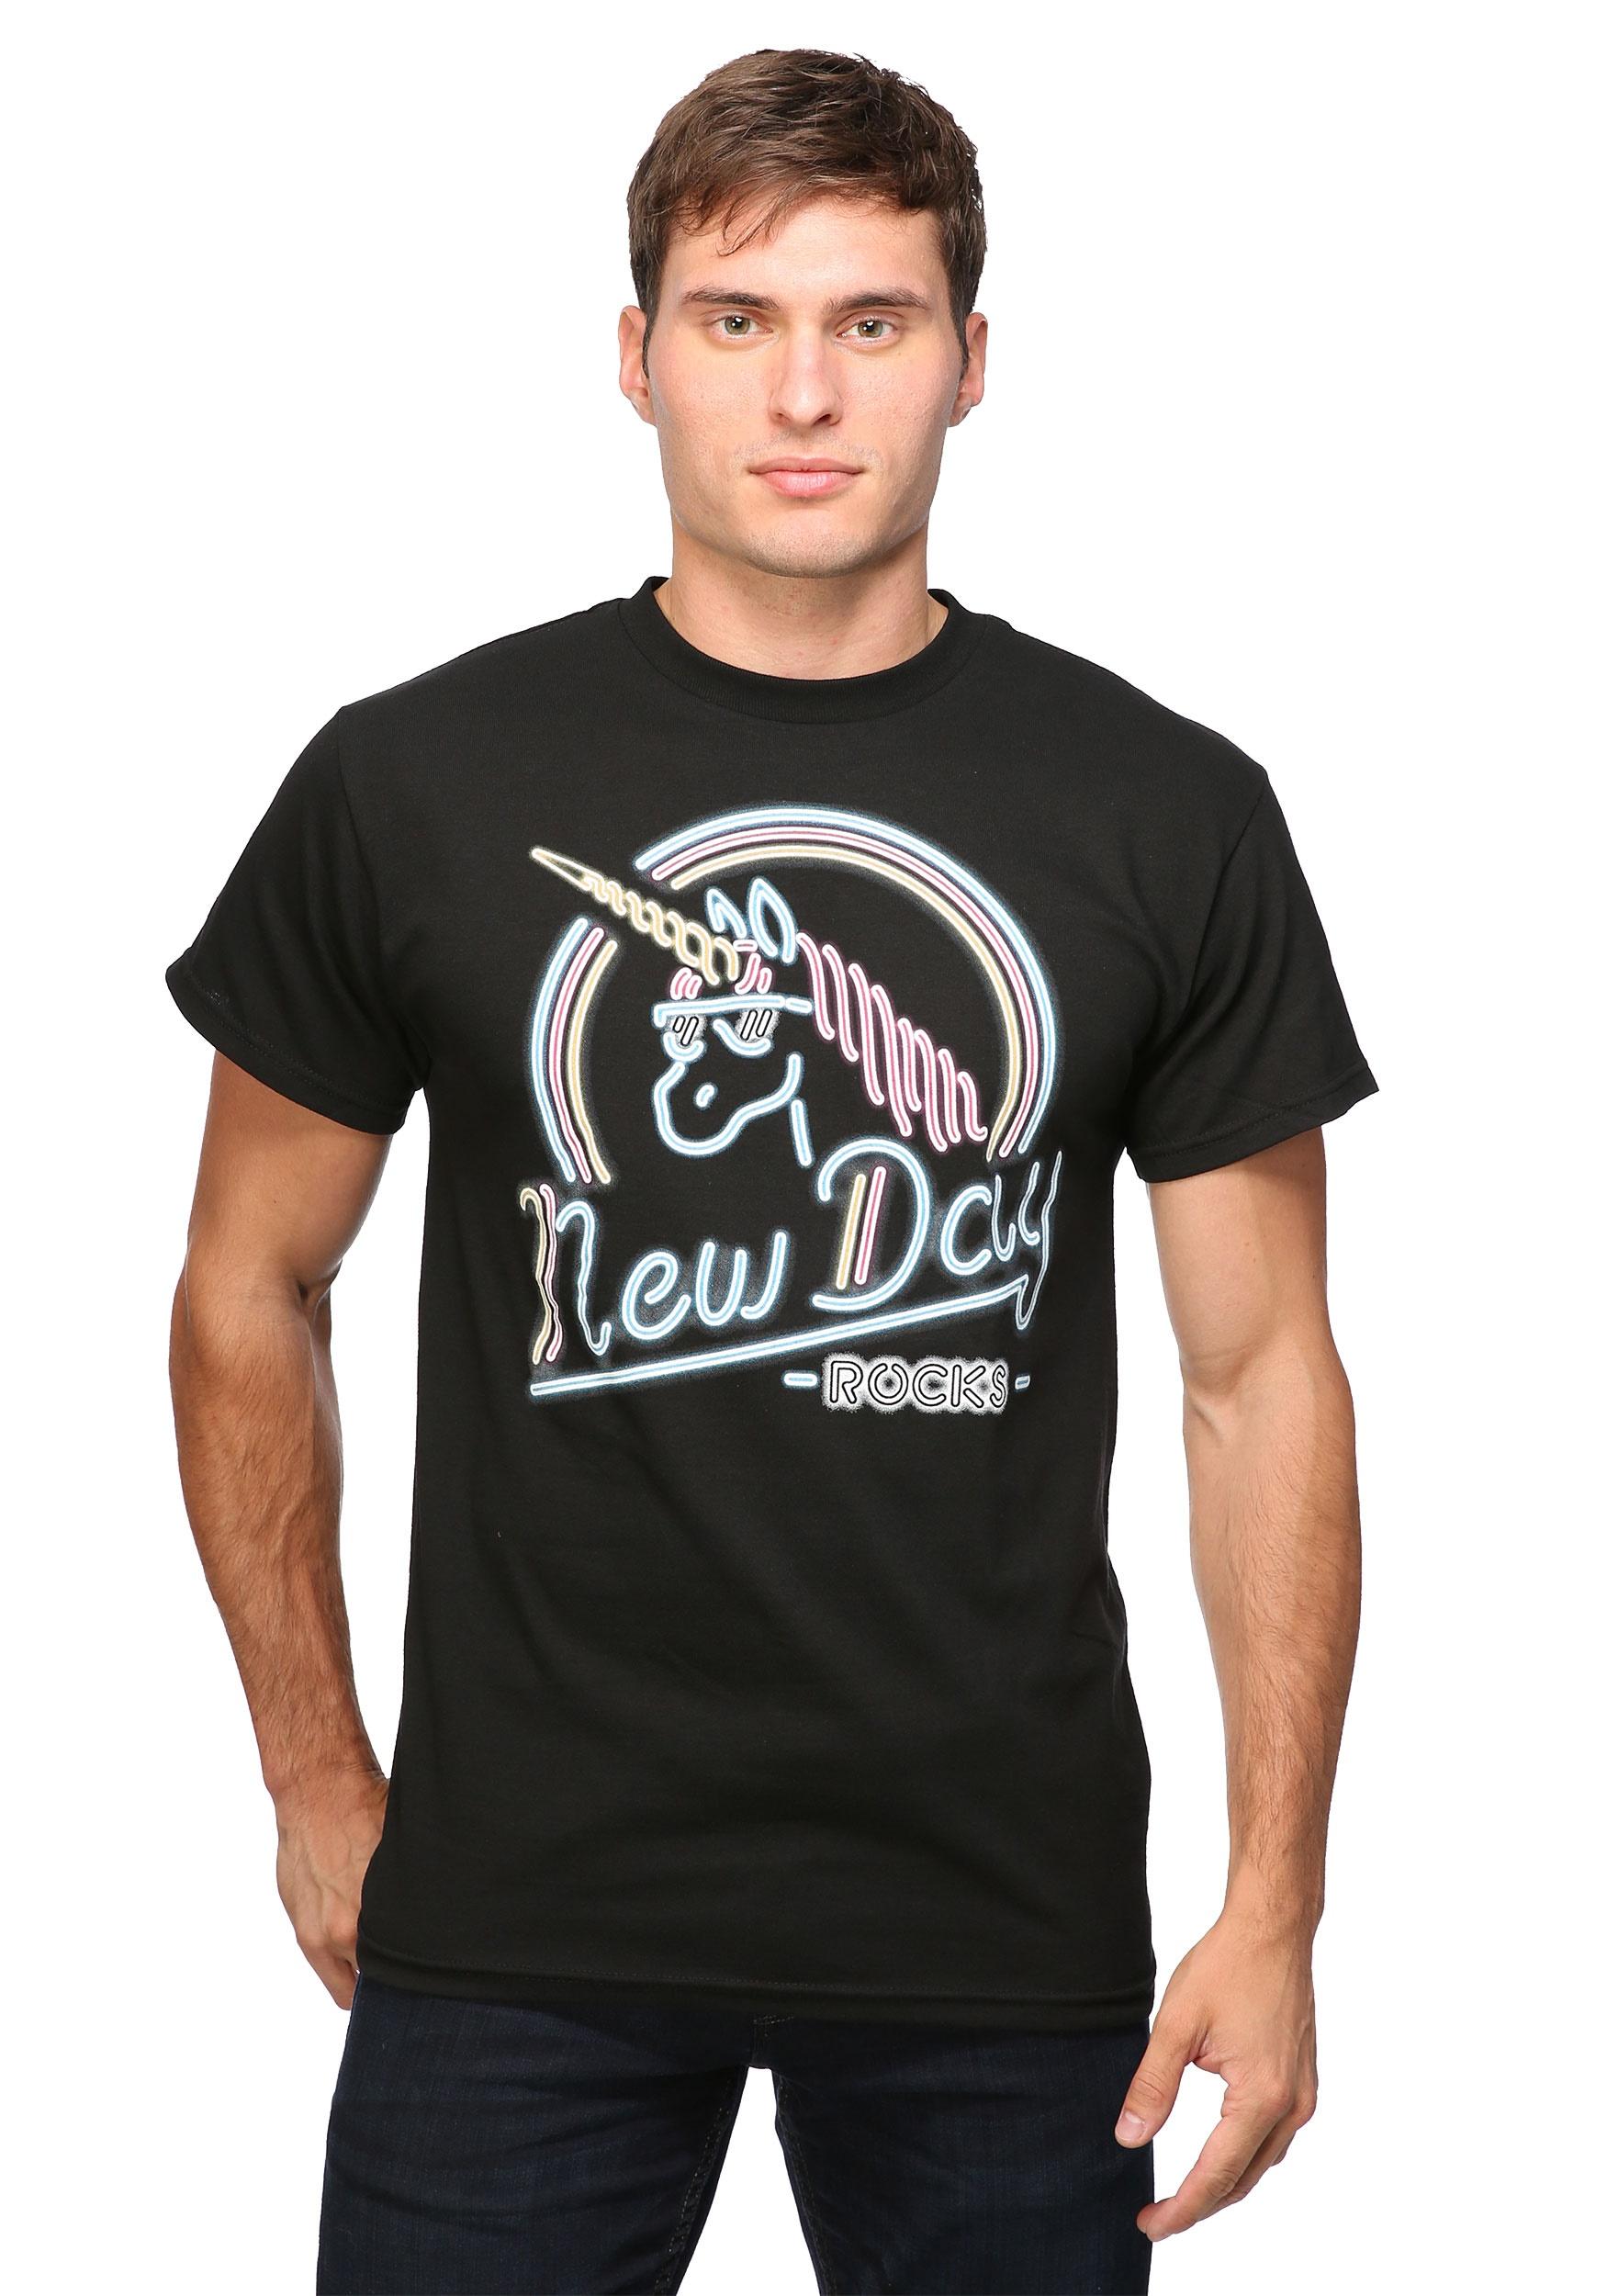 WWE New Day Rocks Men's T-Shirt